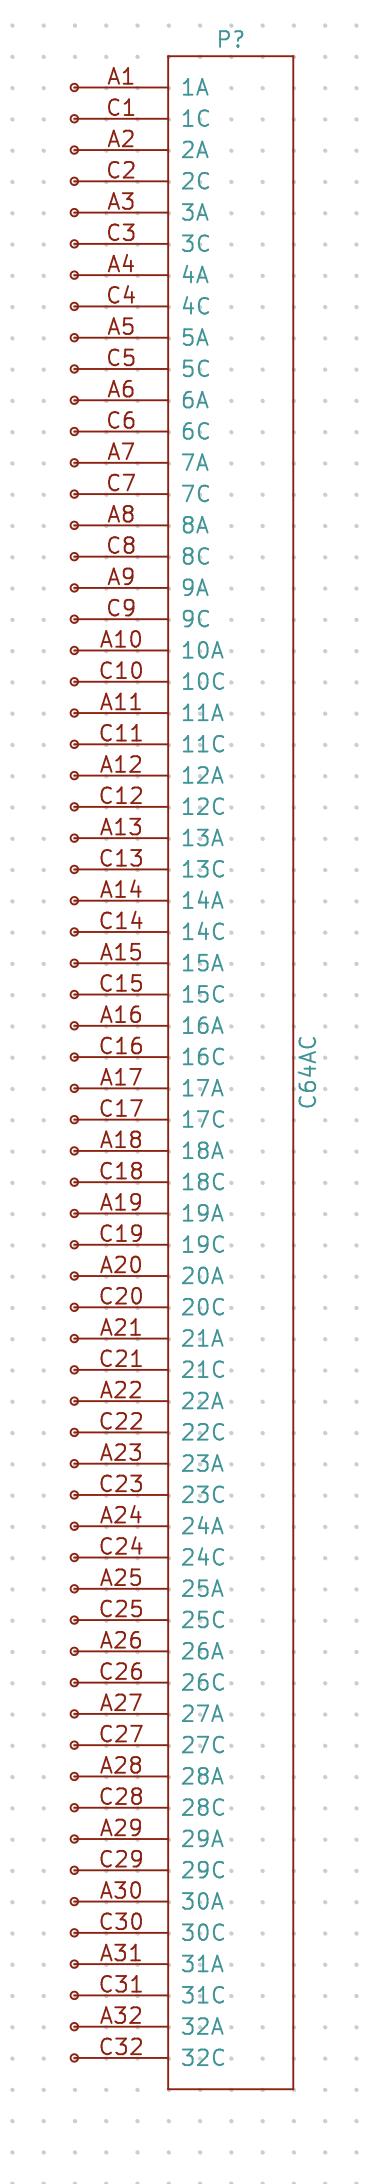 Pcb Design Creating And Editing Parts In Kicad Machina Speculatrix Schematic